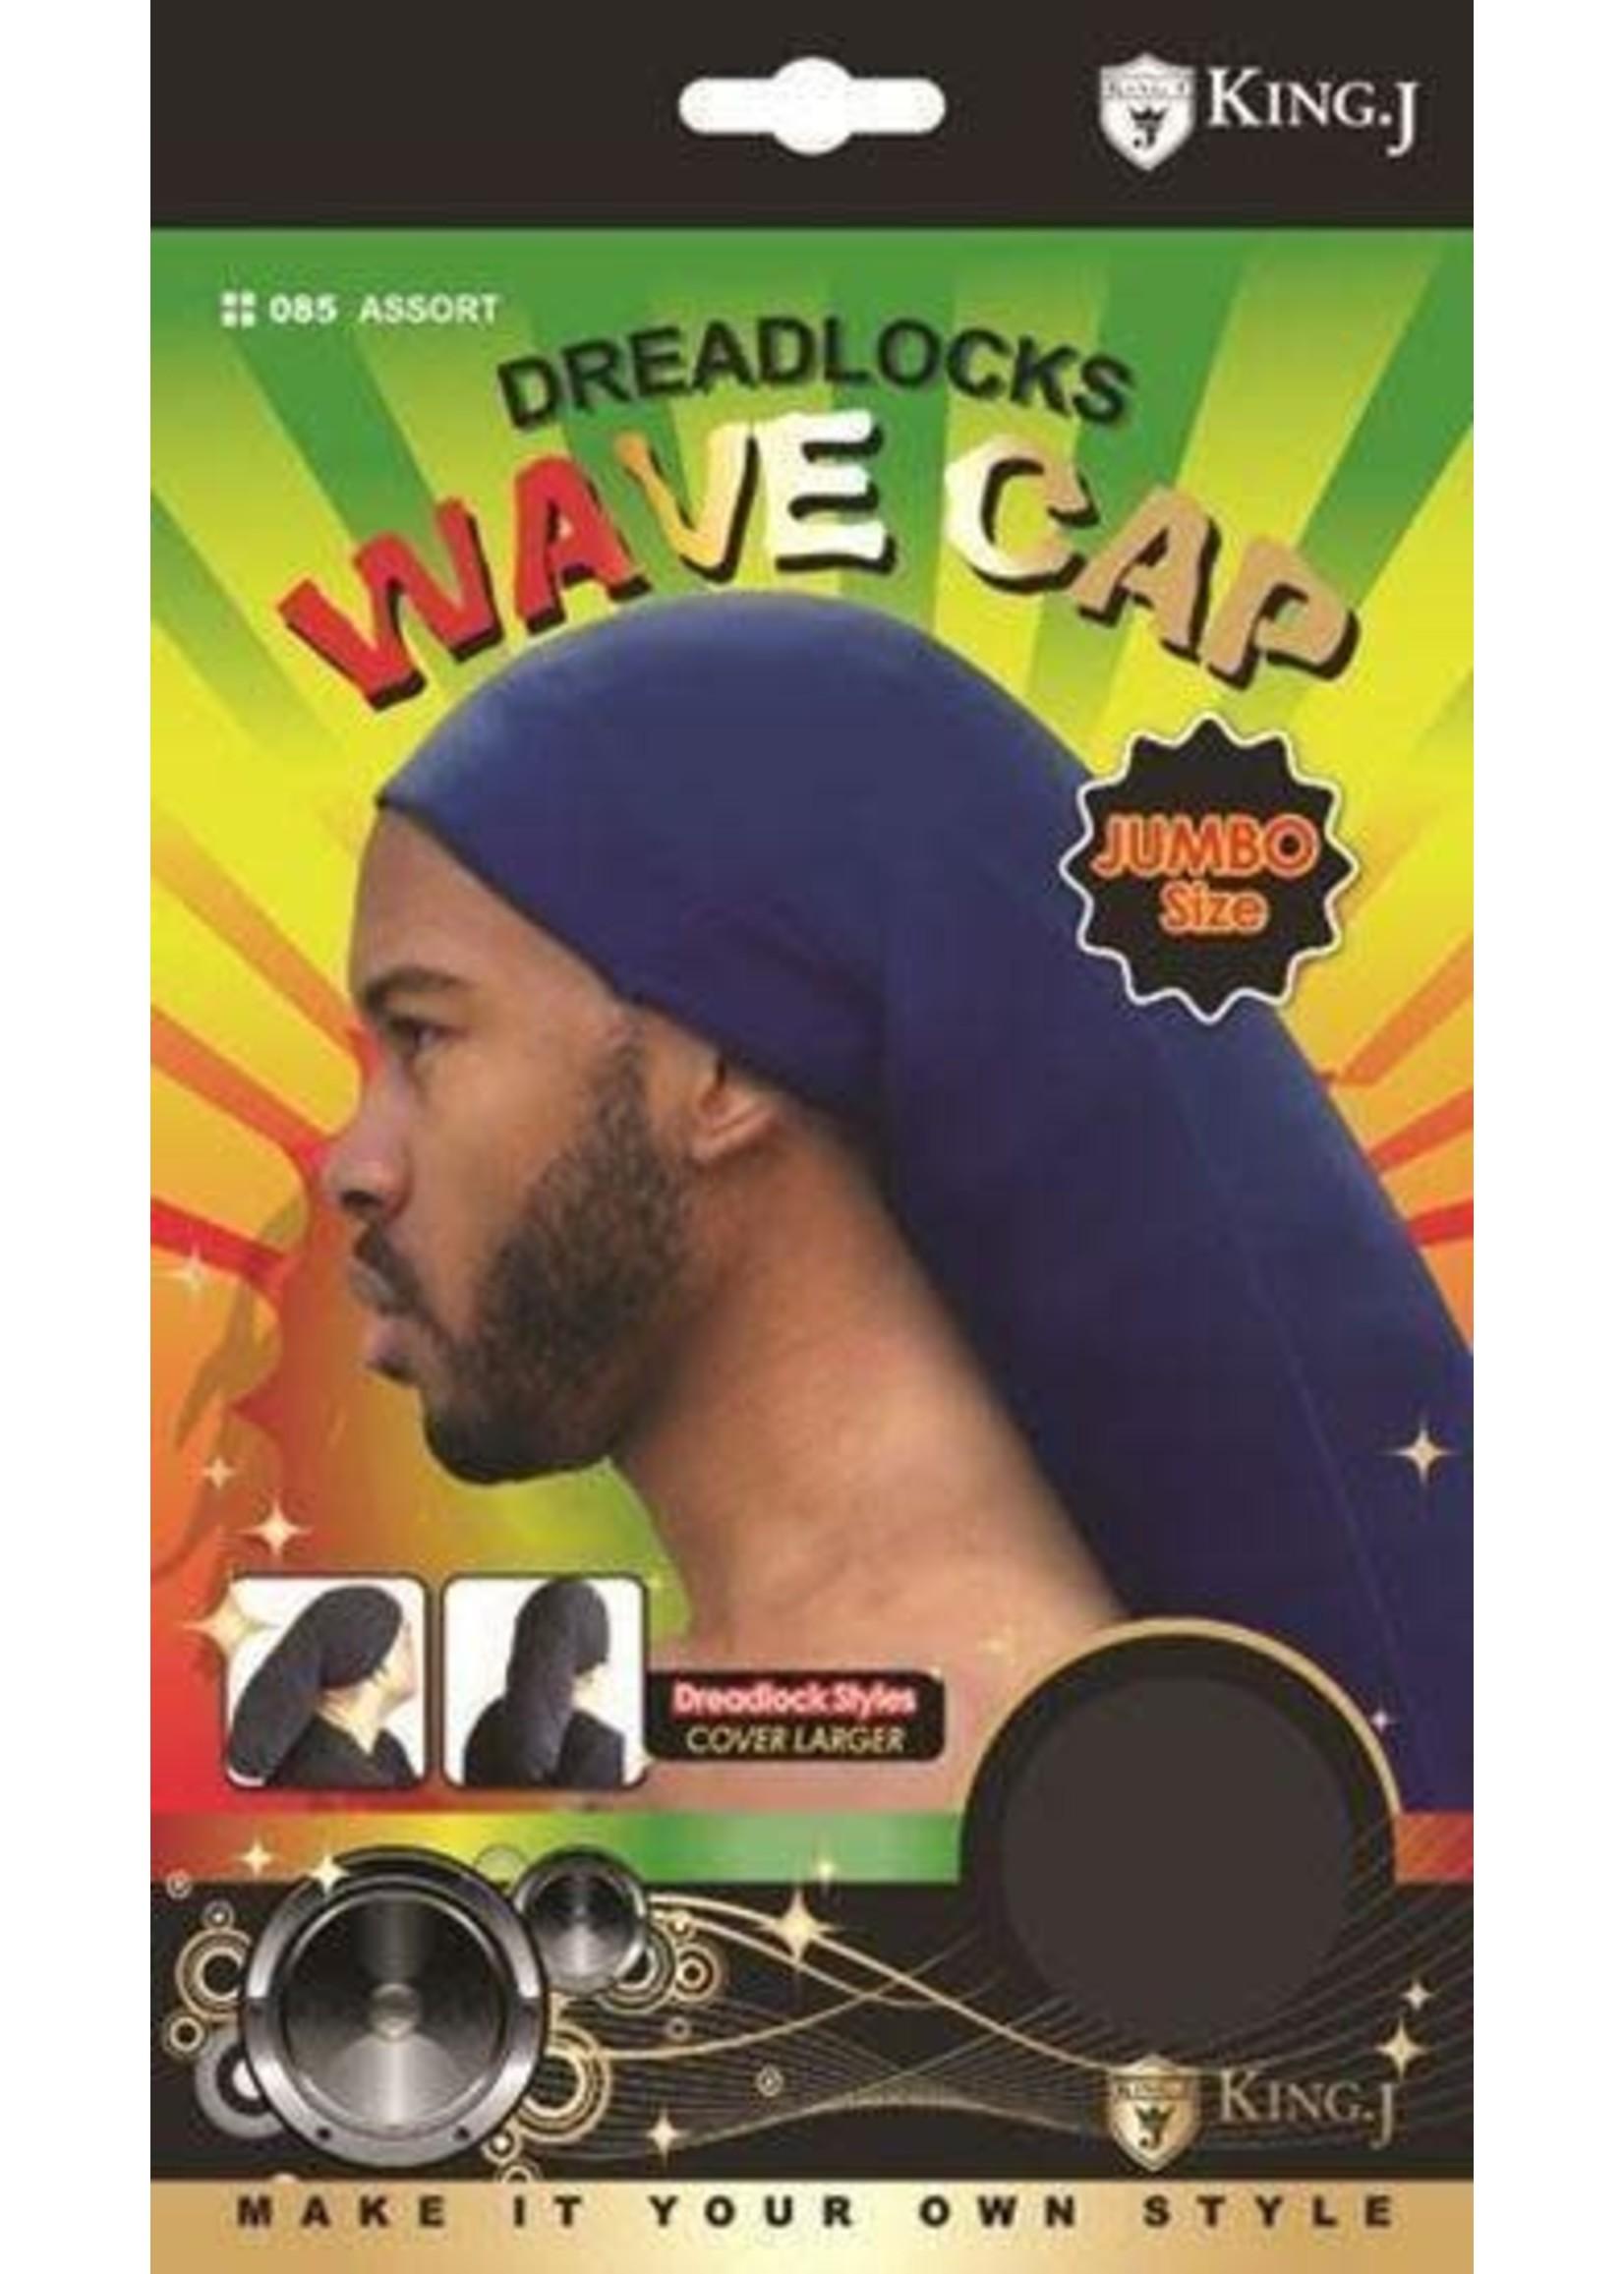 King J Dreadlocks Wave Camp Jumbo Black